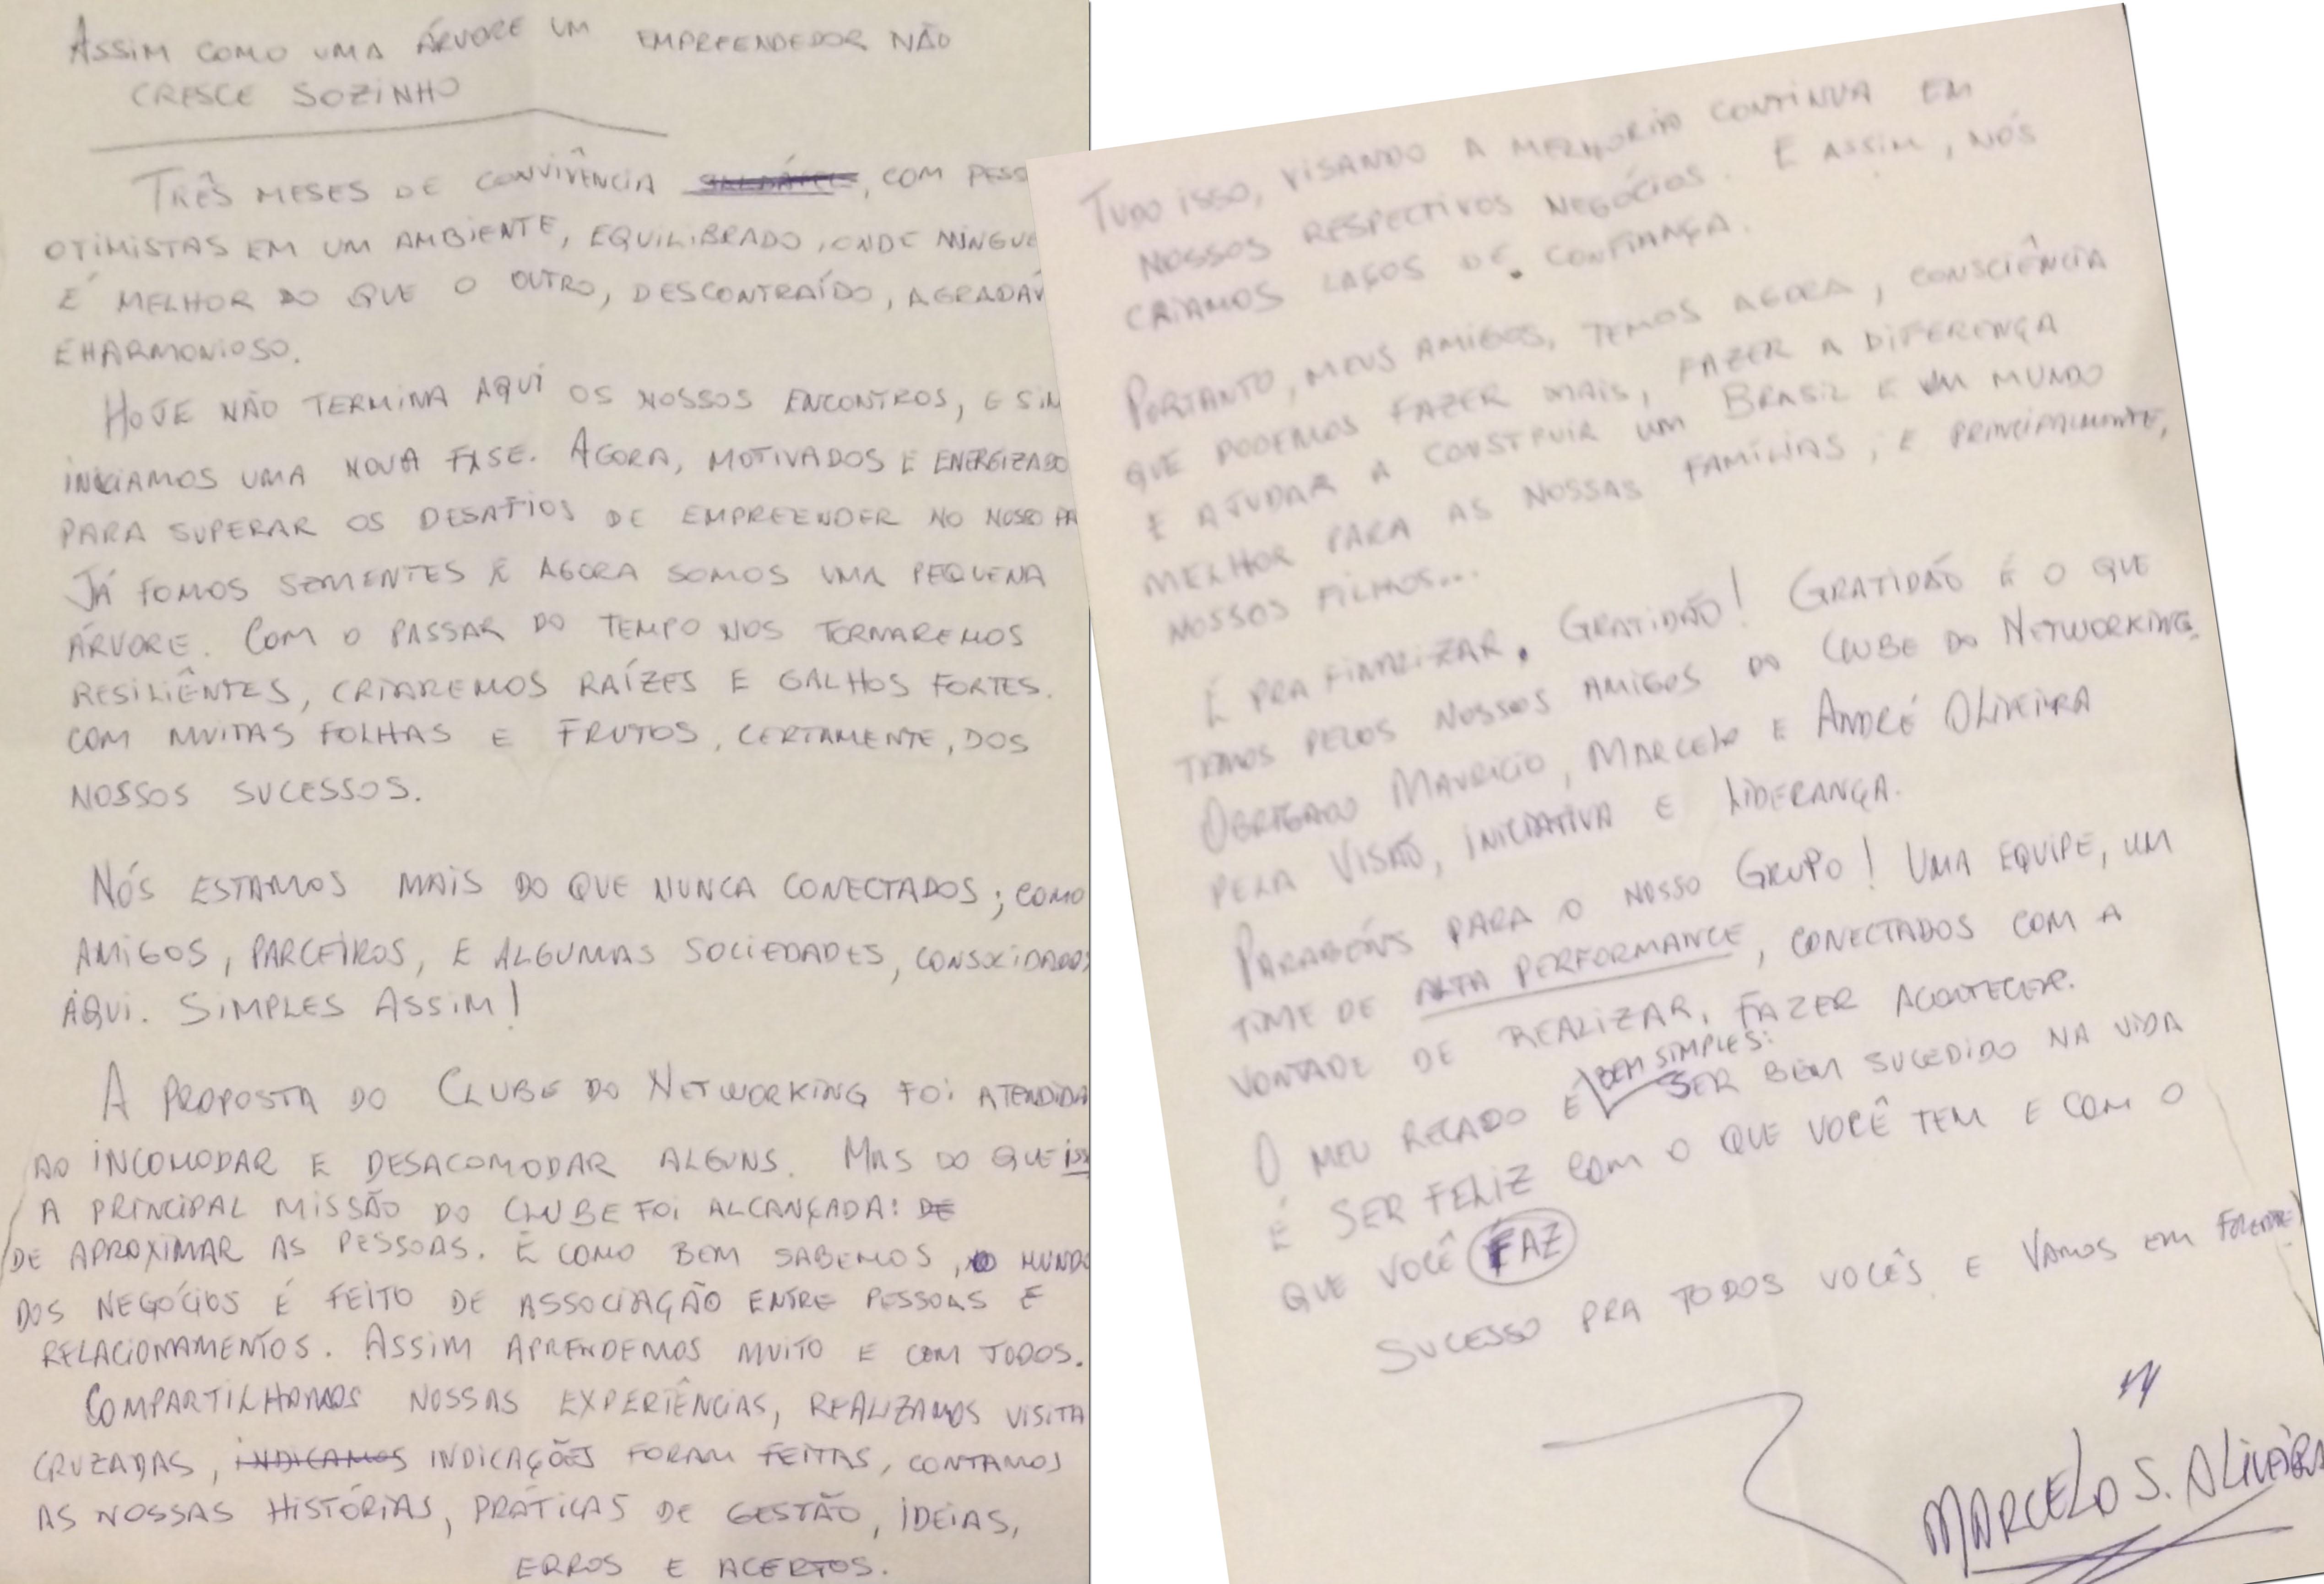 Carta Marcelo S. Oliveira